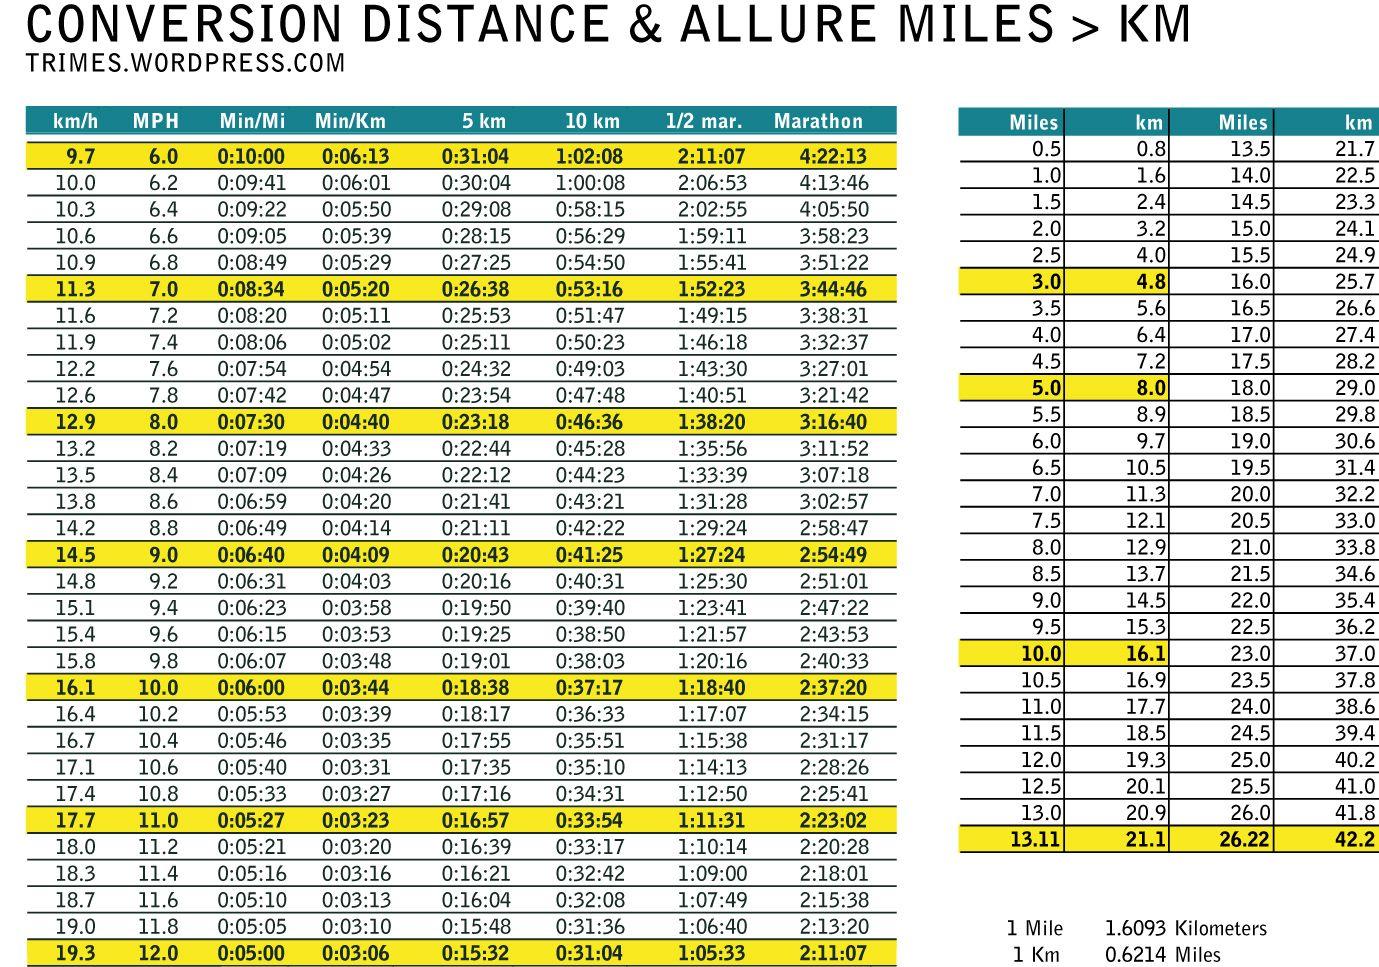 Miles Km Converter Tableau De Conversion Tableau